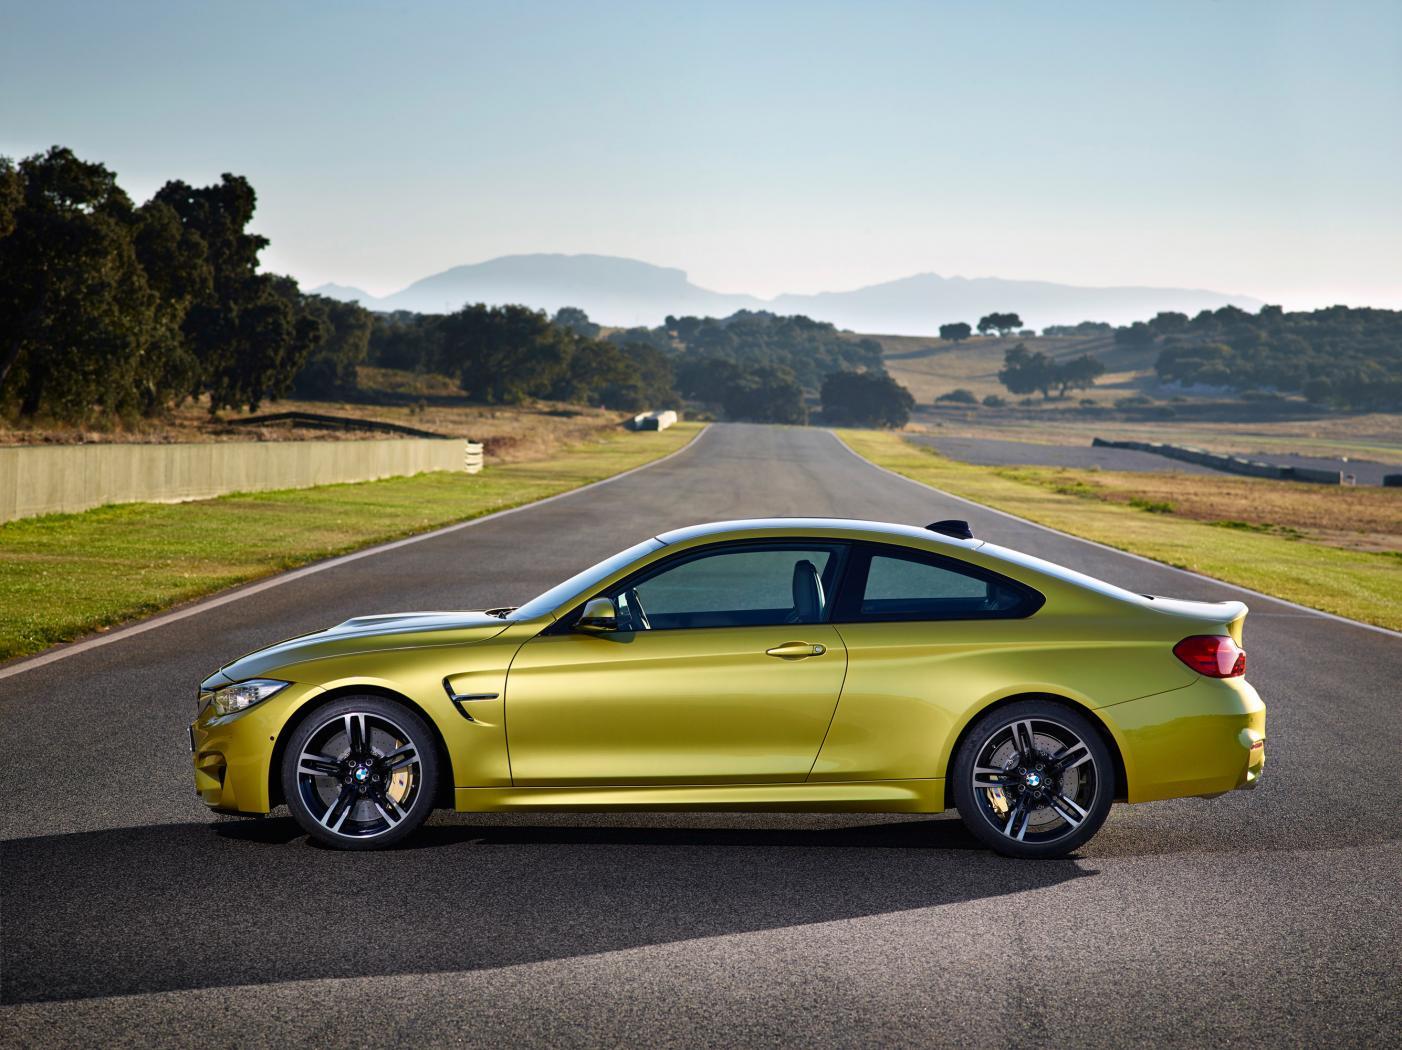 BMW-M4_20170407-1822.jpeg